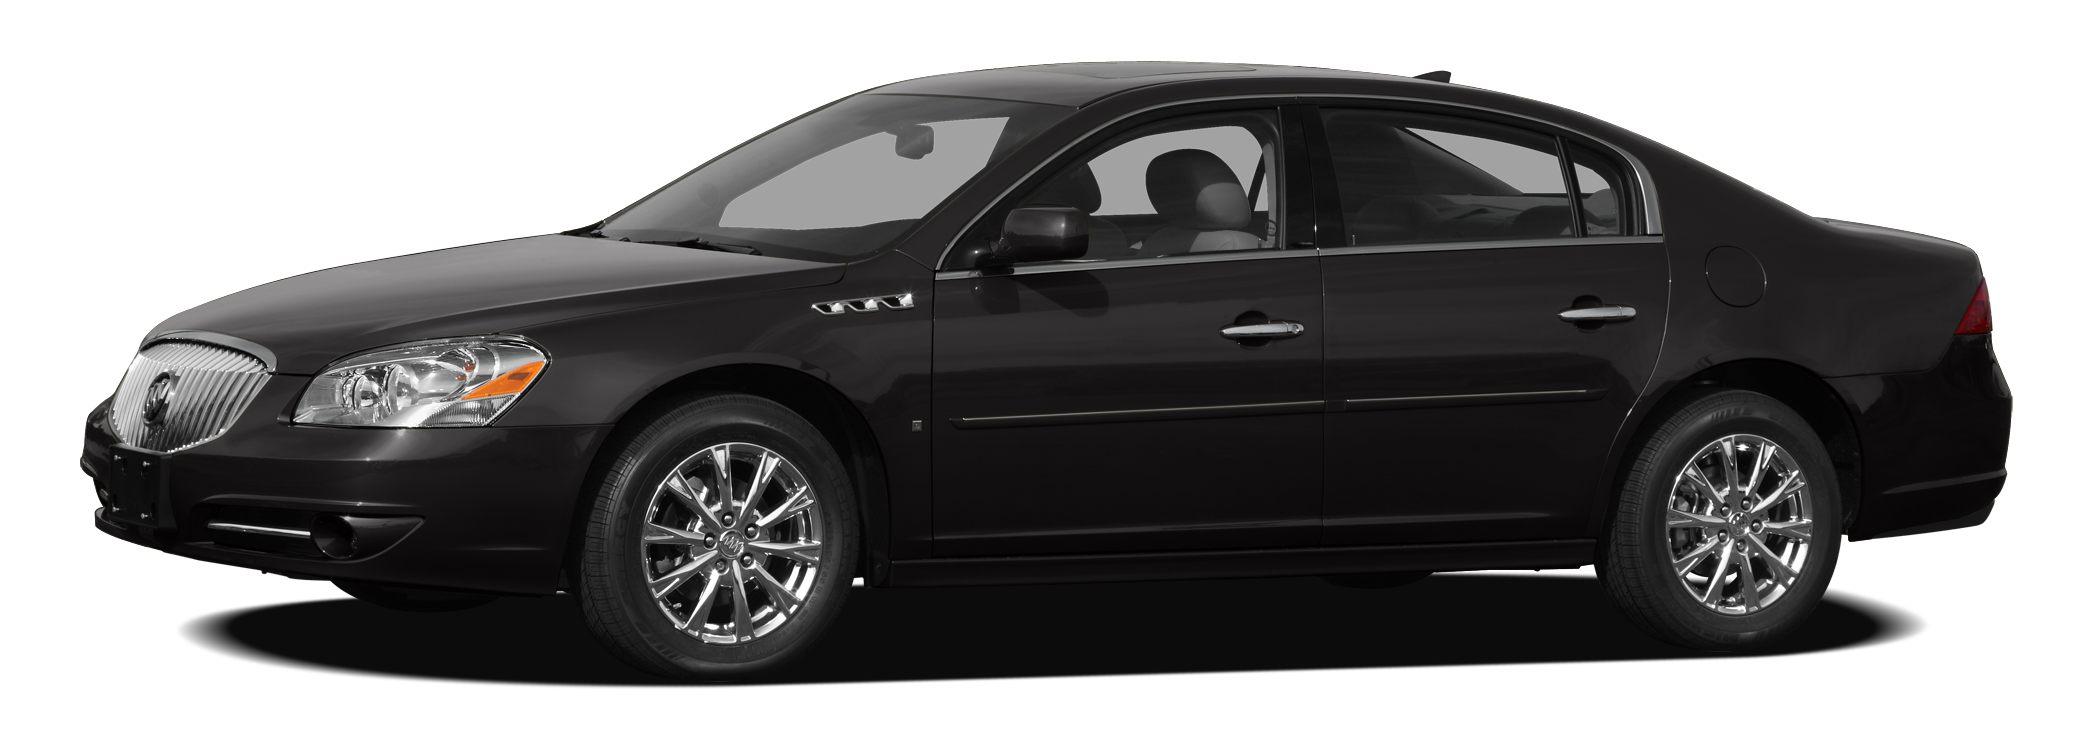 2010 Buick Lucerne CXL Driver Confidence Package Remote Vehicle Starter System StabiliTrak Stabi